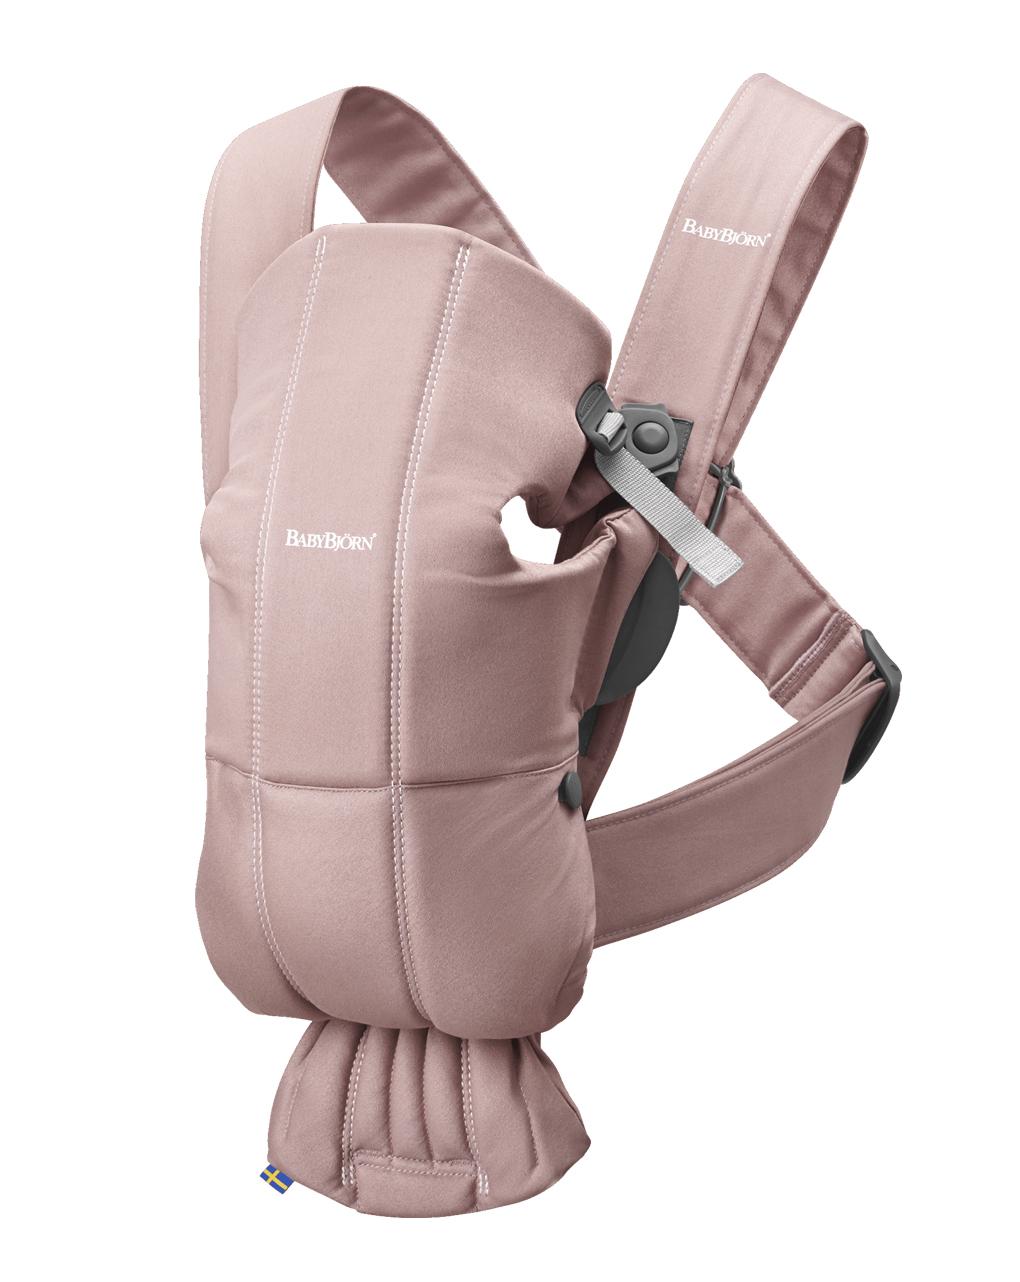 Marsupio baby carrier mini dusty pink cotton - Baby Bjorn